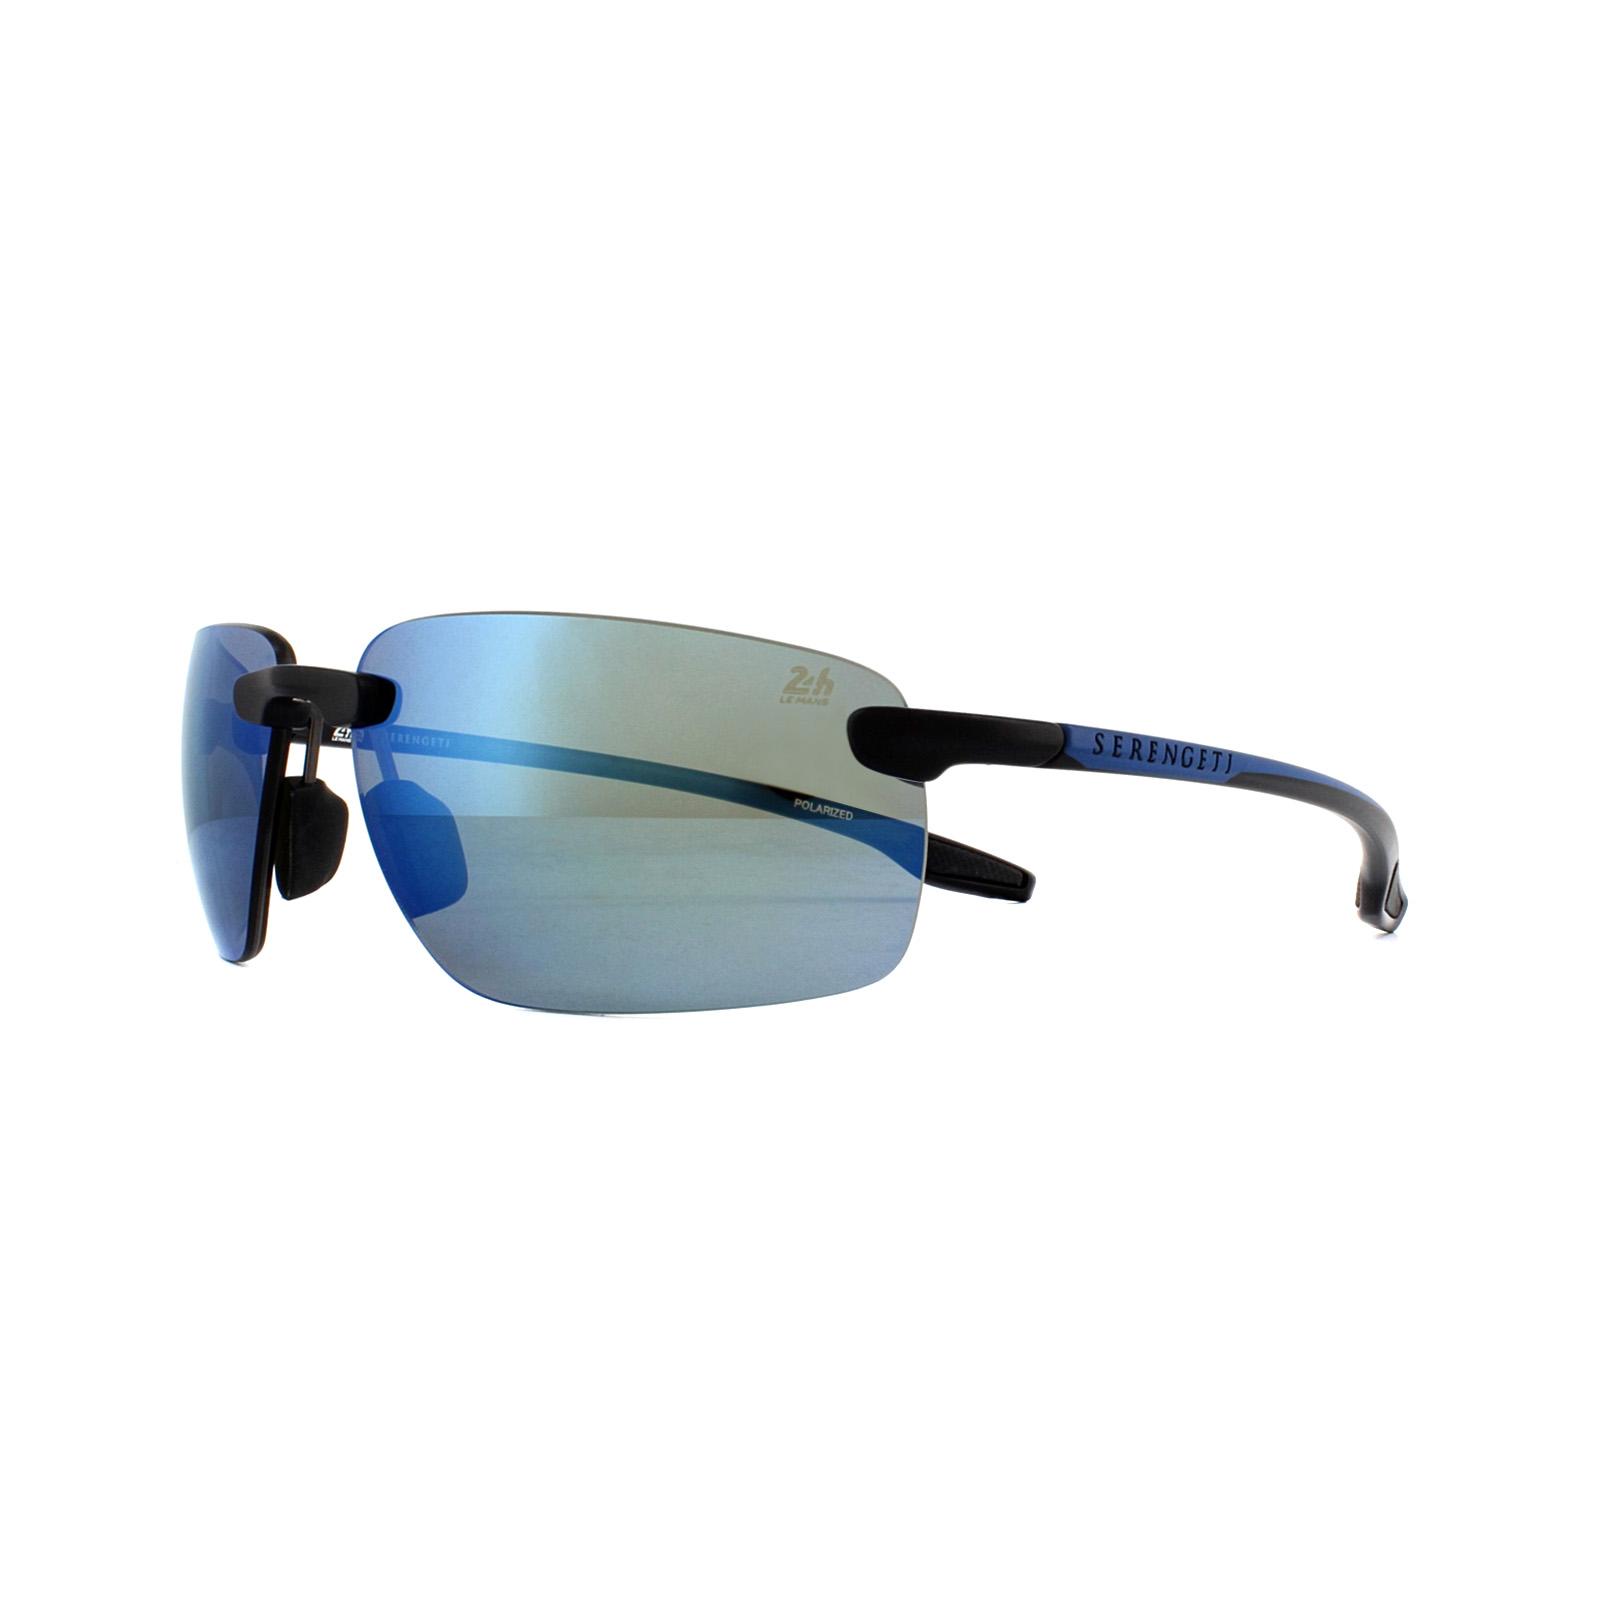 12bc34e420 Cheap Serengeti Erice Sunglasses - Discounted Sunglasses